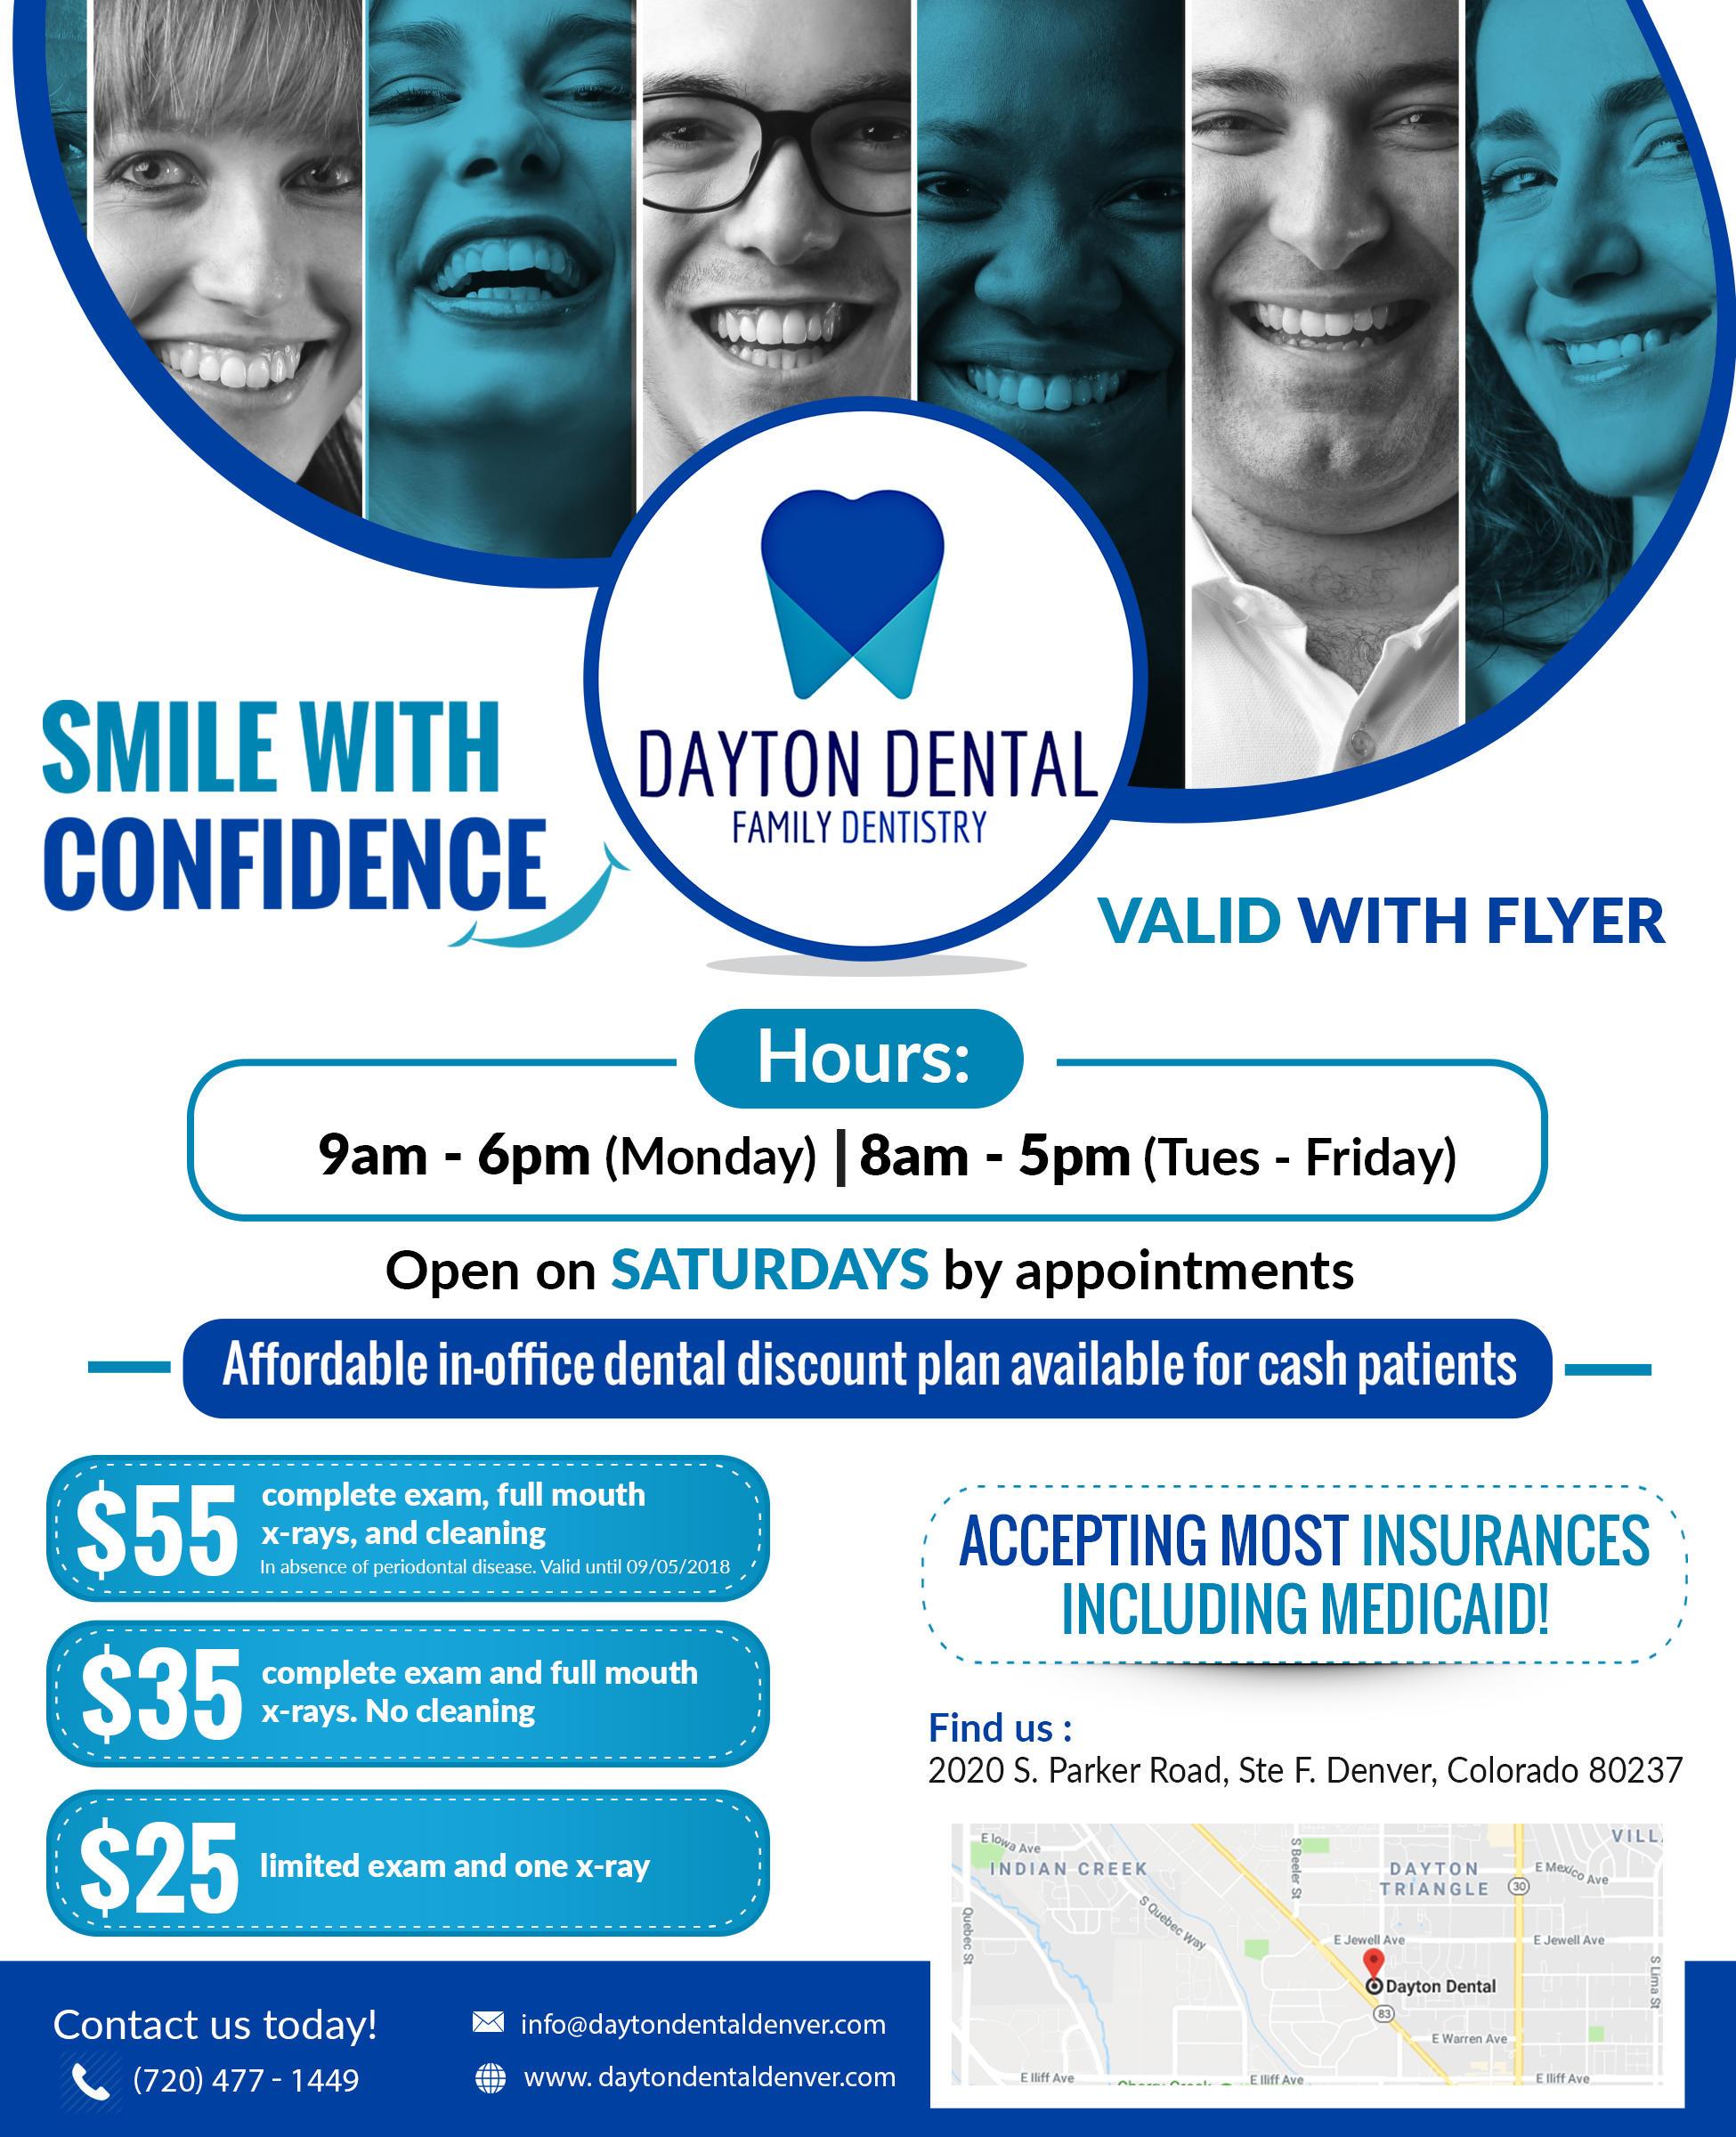 Dayton Dental